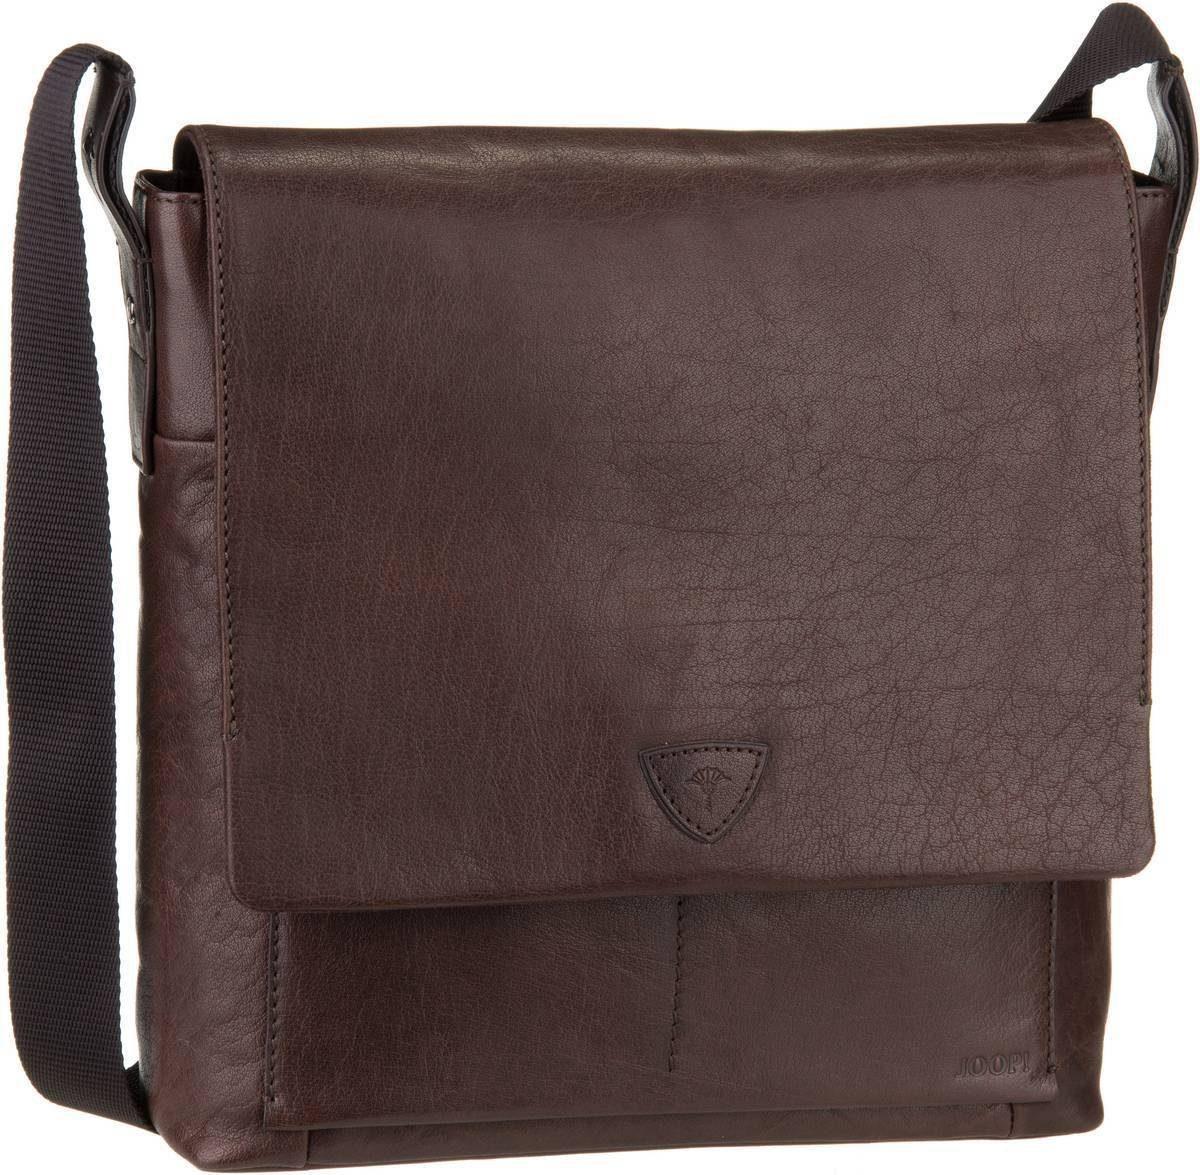 Joop! Notebooktasche / Tablet »Brenta Belos ShoulderBag MVF«